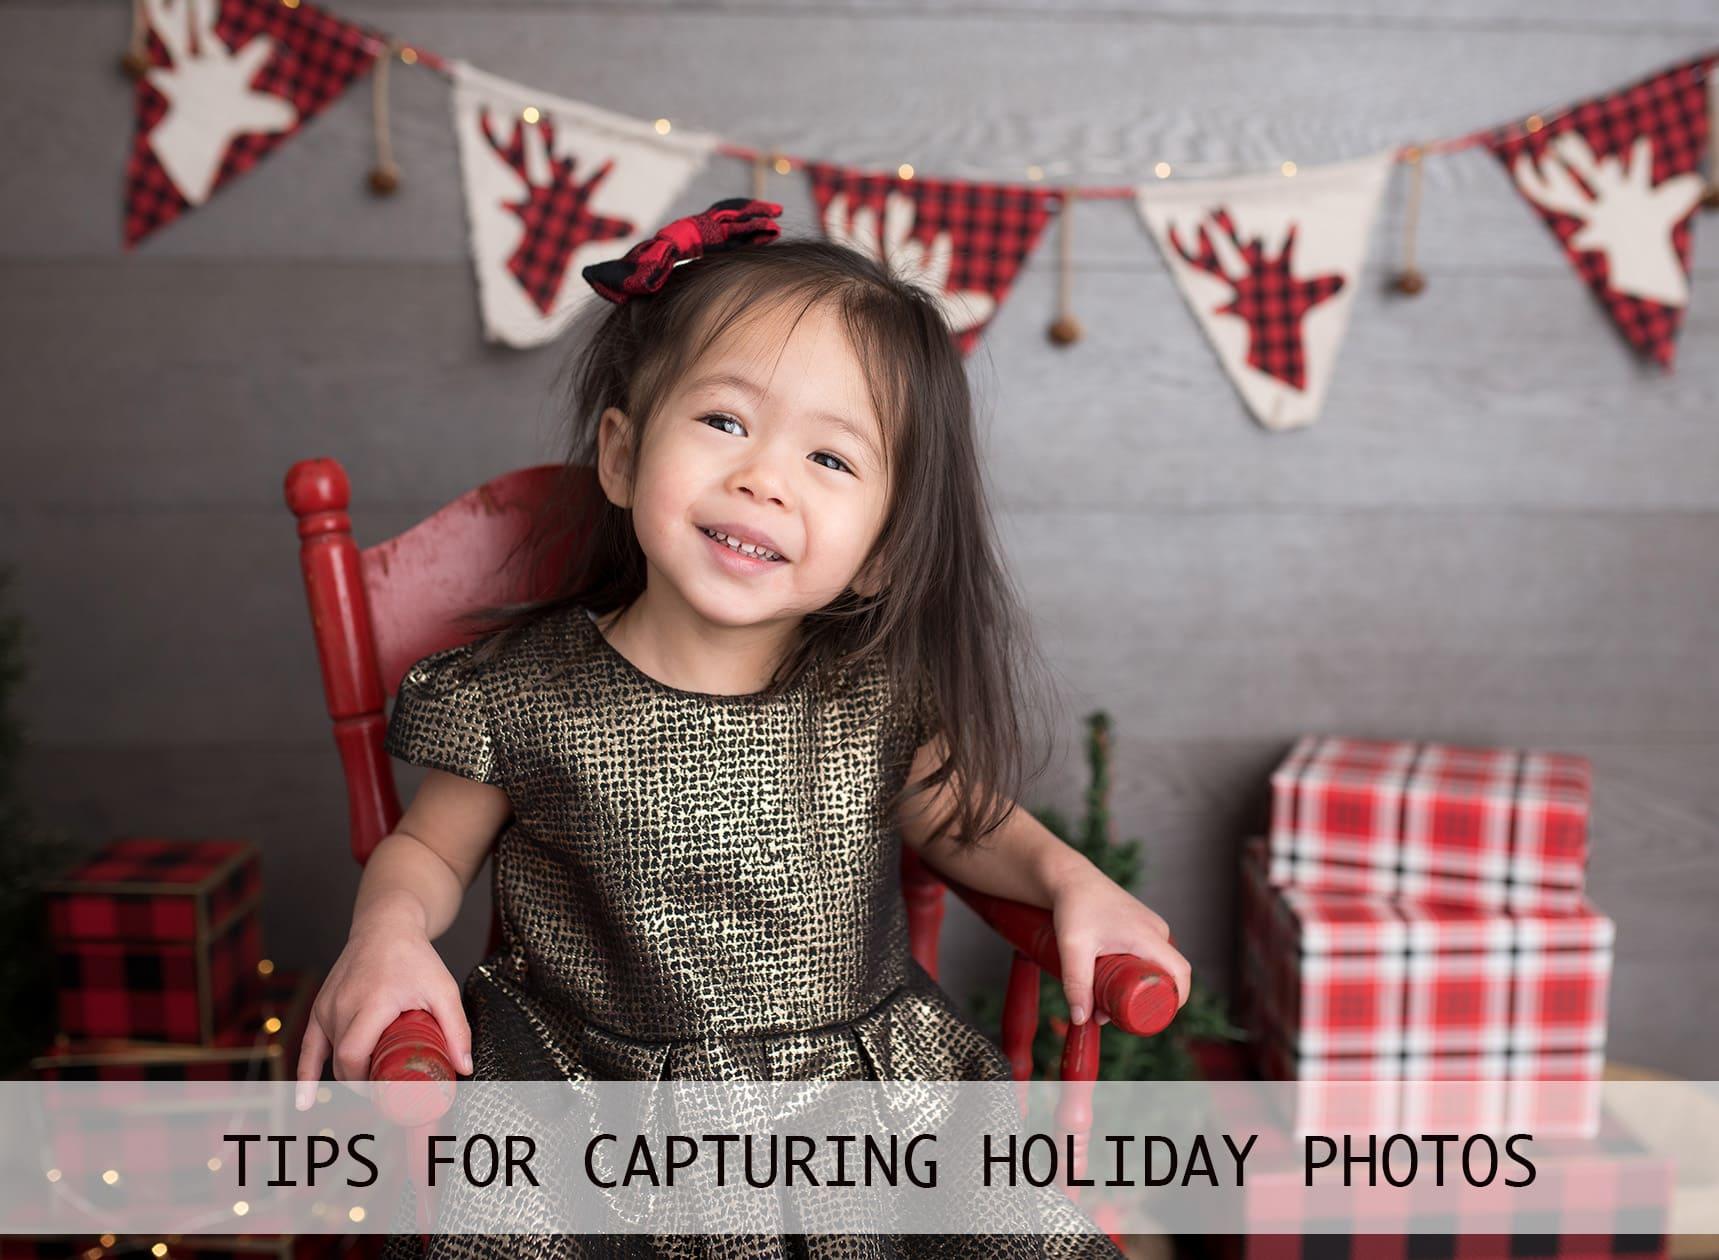 PICTONAT PHOTOGRAPHY HOLIDAY PHOTO TIPS